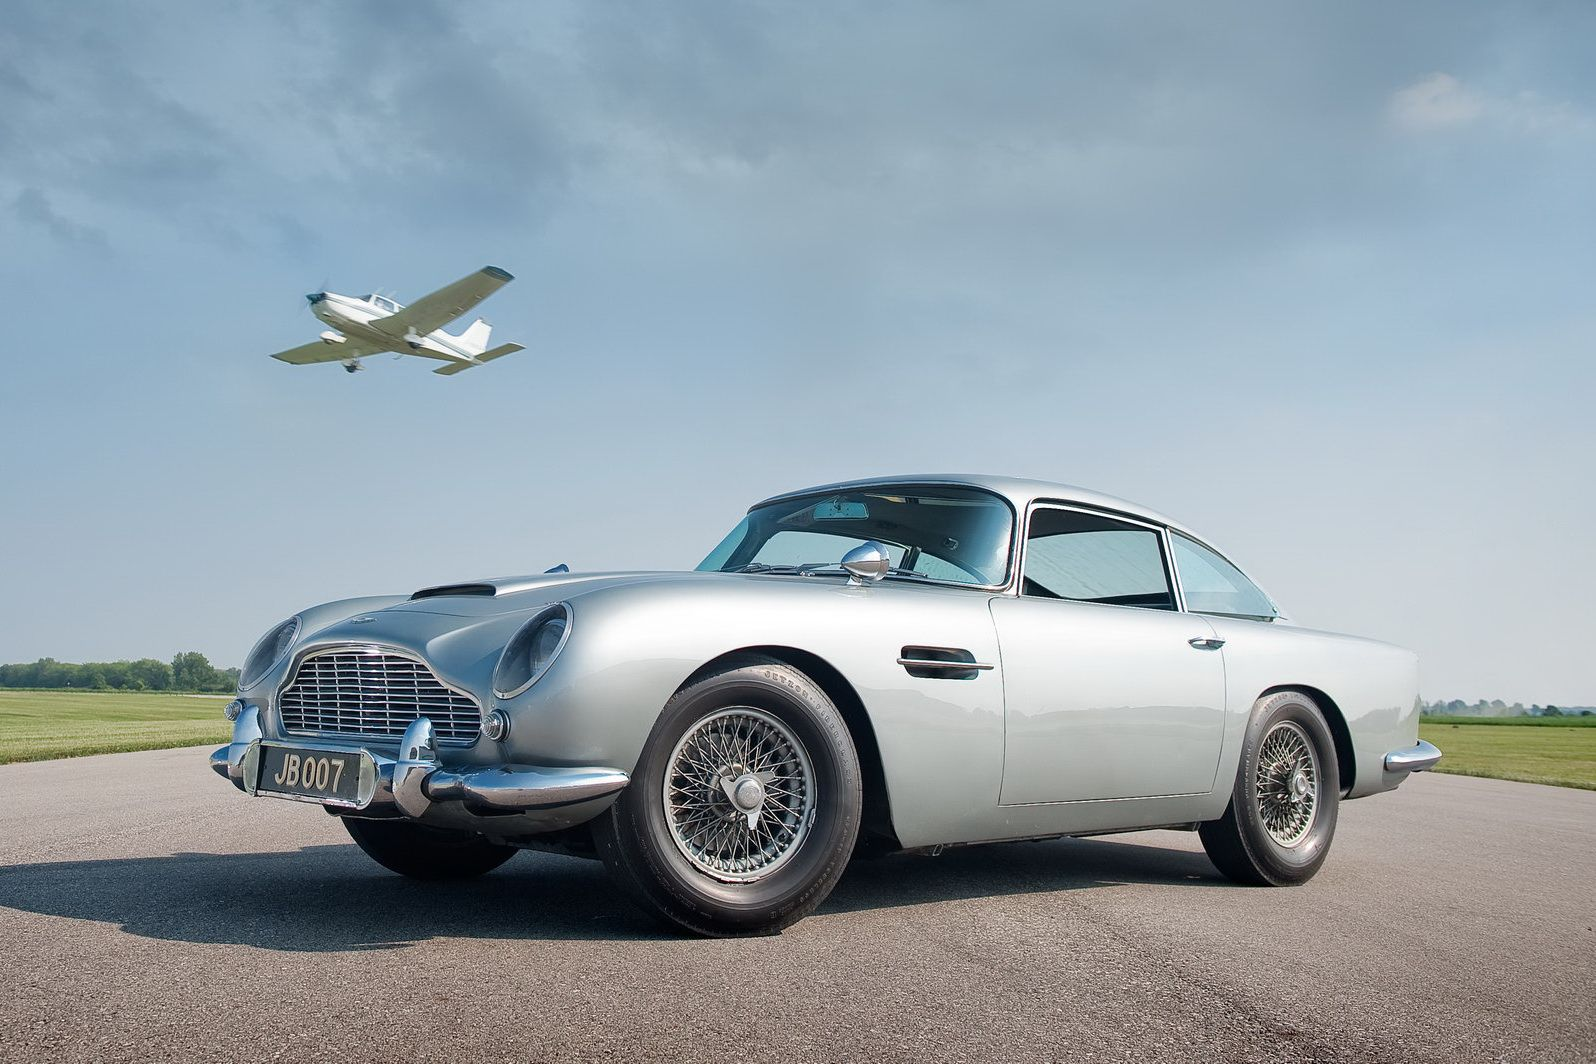 James Bond S Original 007 Aston Martin Db5 Aston Martin Db5 Aston Martin James Bond Cars